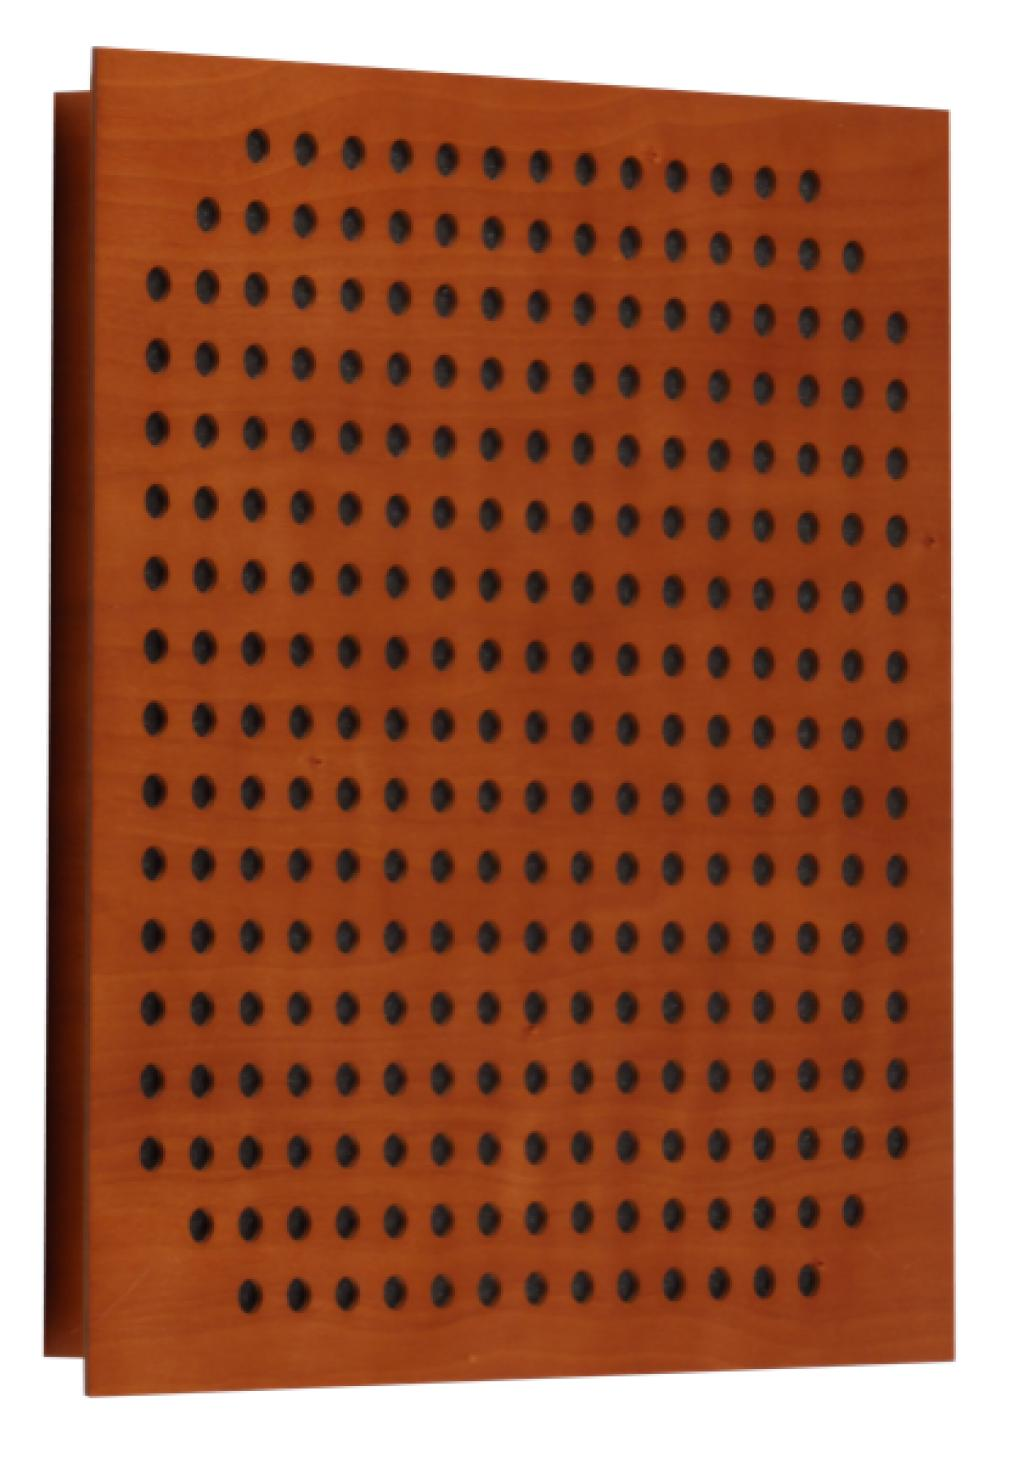 Panou Fonoabsorbant Vicoustic Square Tile 60.4 Wen